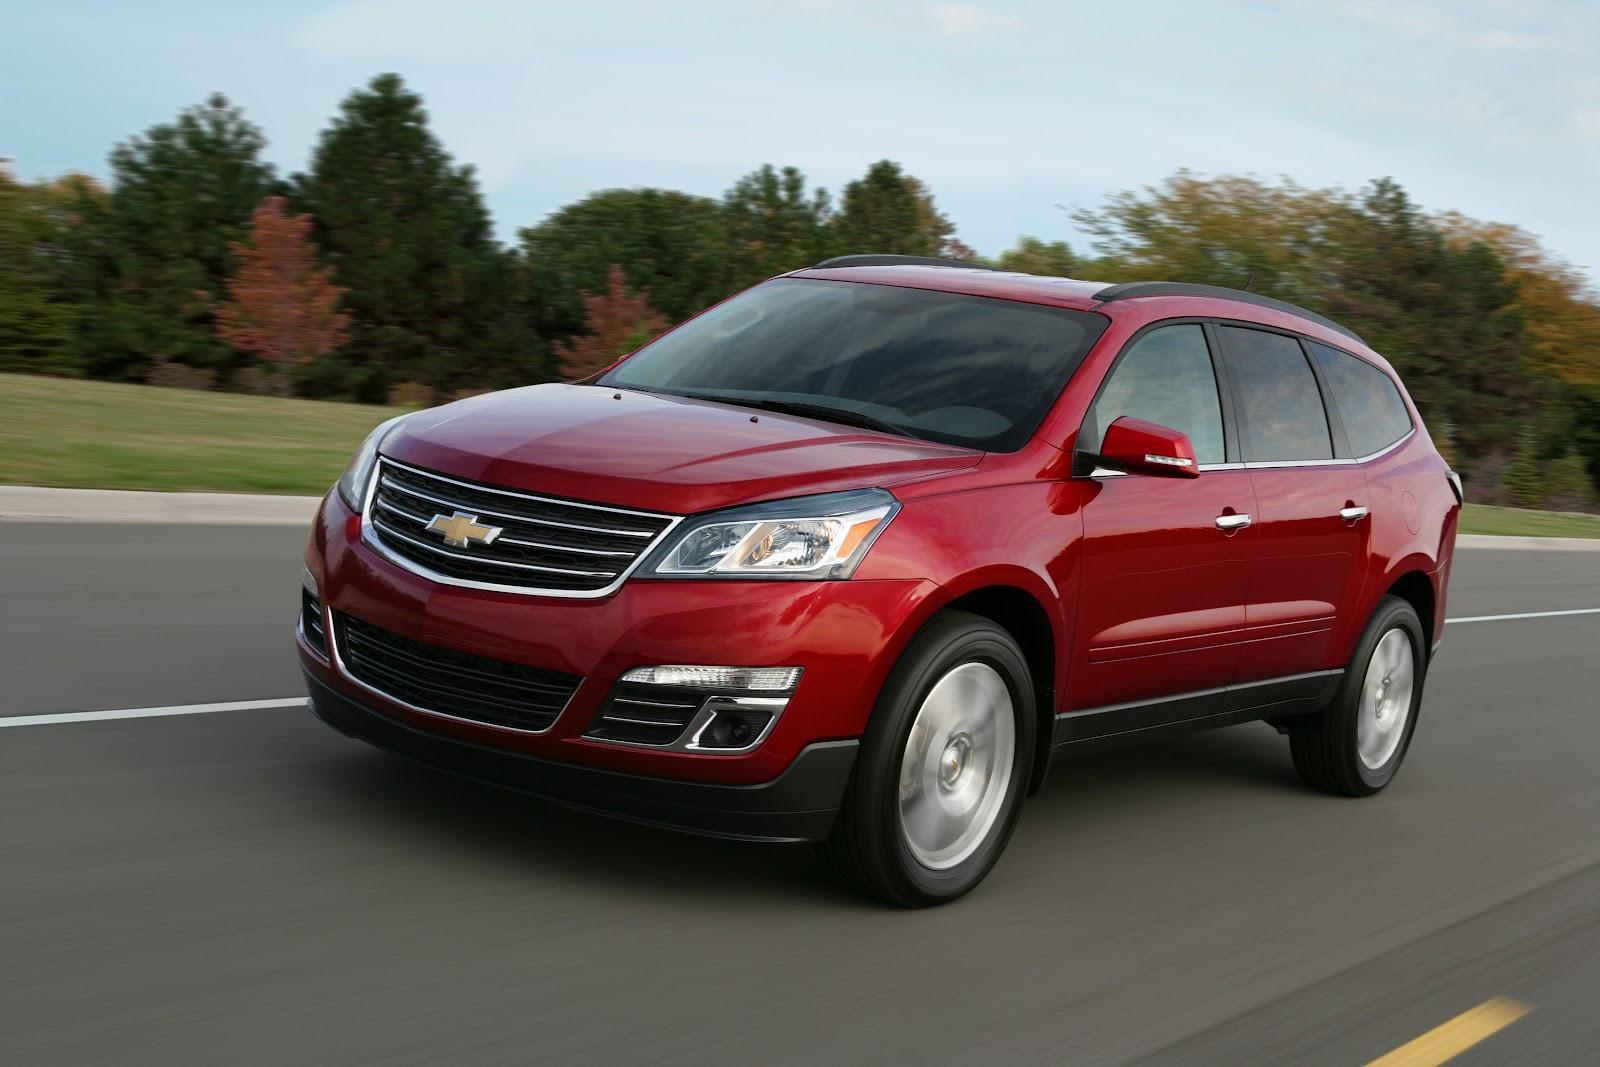 chevrolet - 2009 - [Chevrolet] traverse 2013+chevrolet+traverse+1